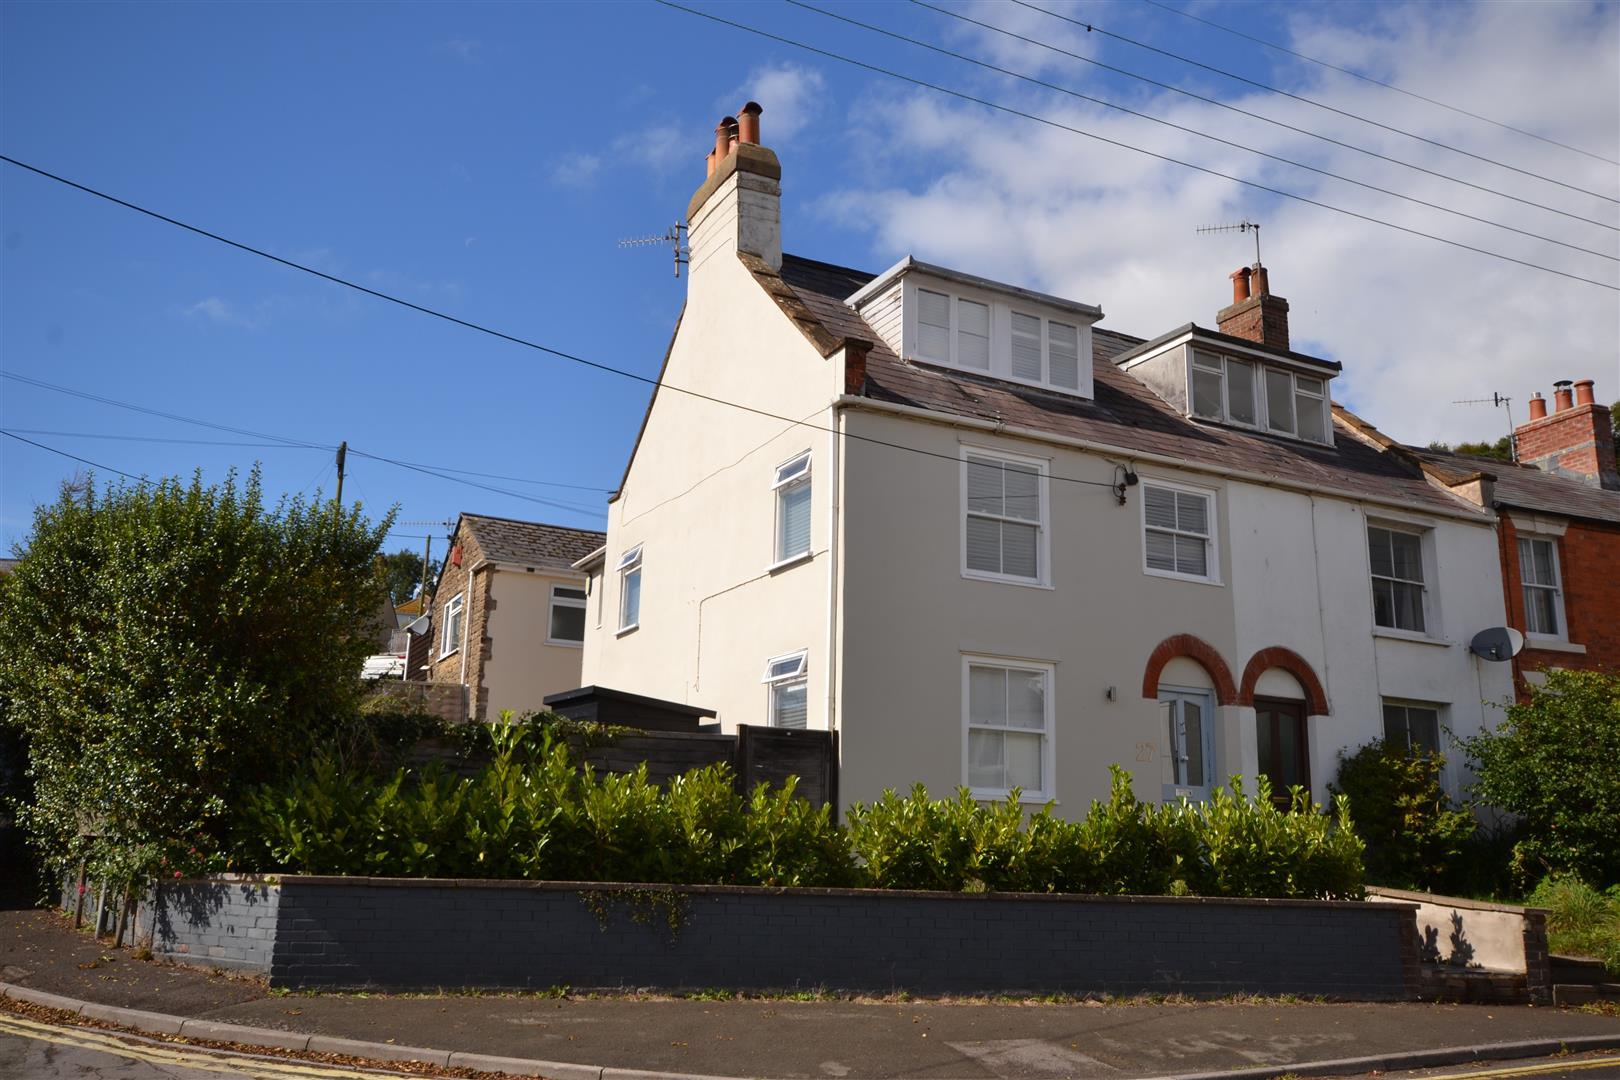 4 Bedrooms Property for sale in North Allington, Bridport